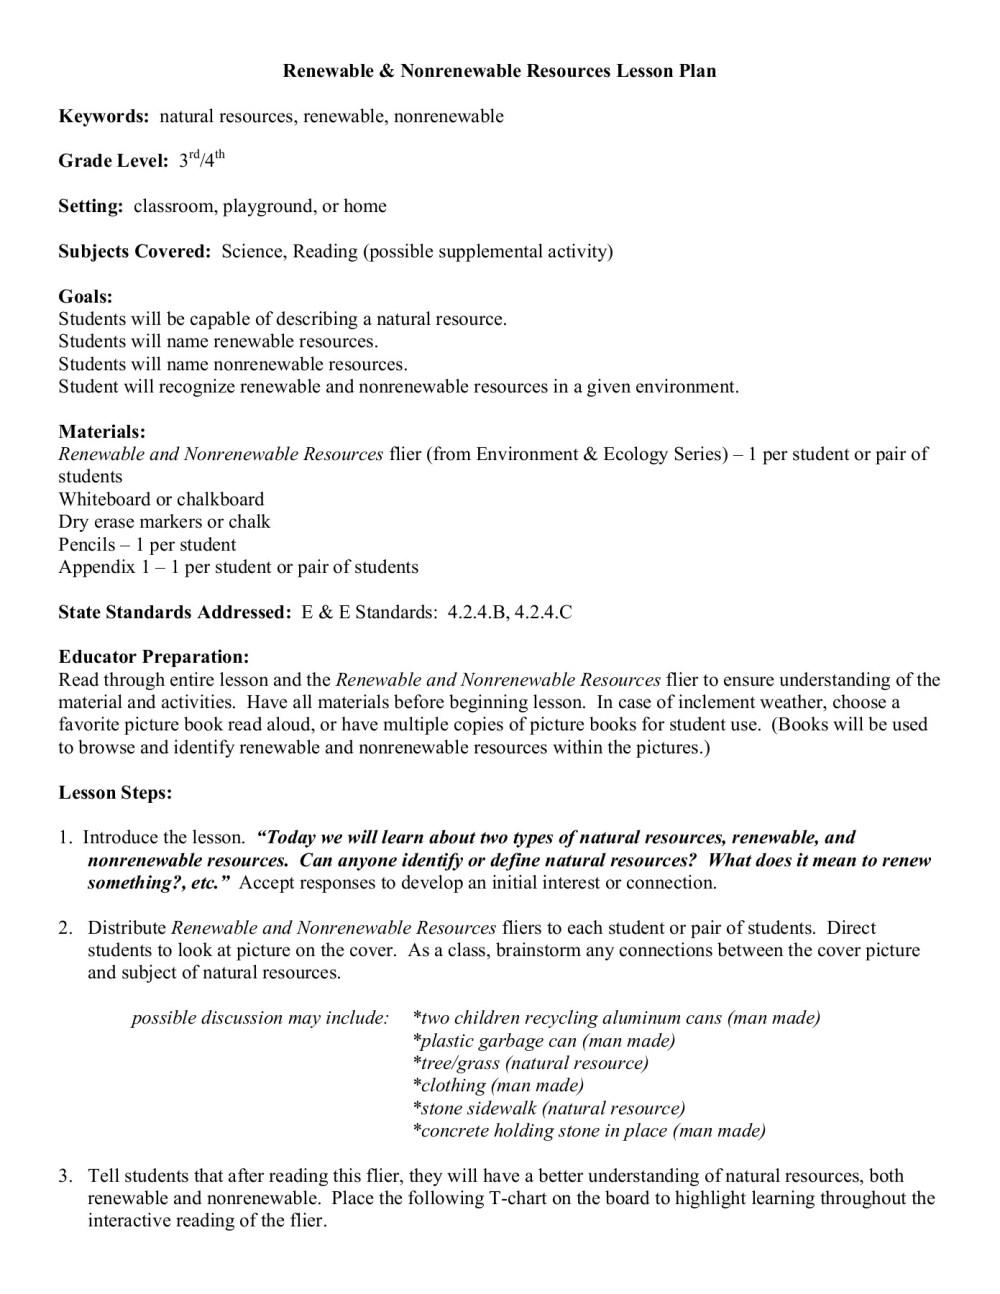 medium resolution of Resources Lesson Plan - Penn State University-Flip eBook Pages 1 - 4   AnyFlip   AnyFlip